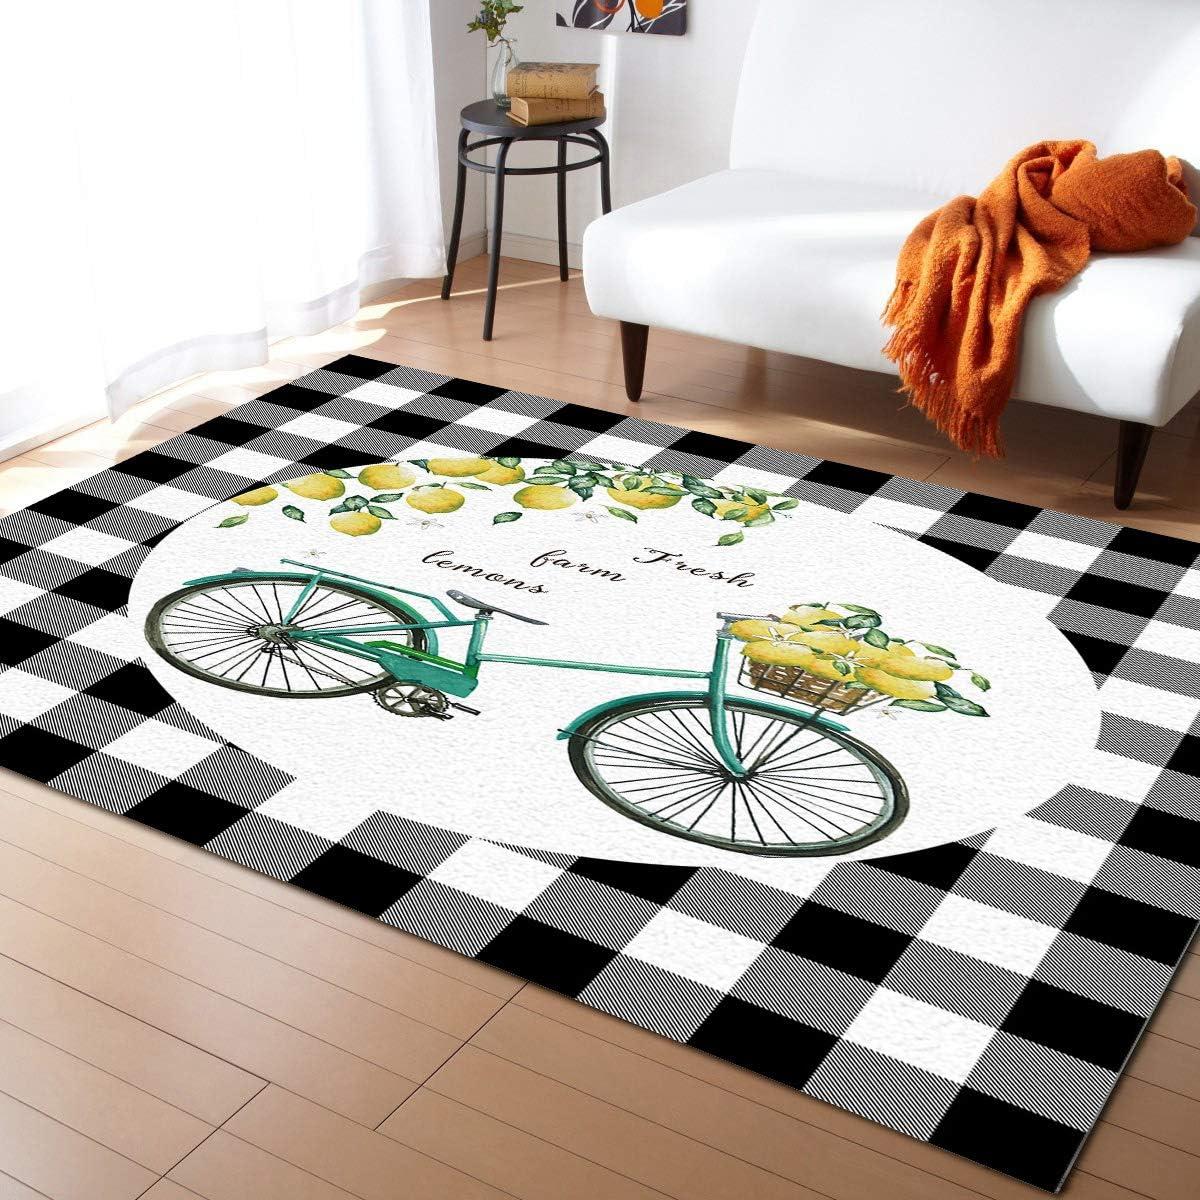 Aomike ☆正規品新品未使用品 Indoor Area Rug Doormat- Black Check Buffalo Lemon C 店内全品対象 Bike